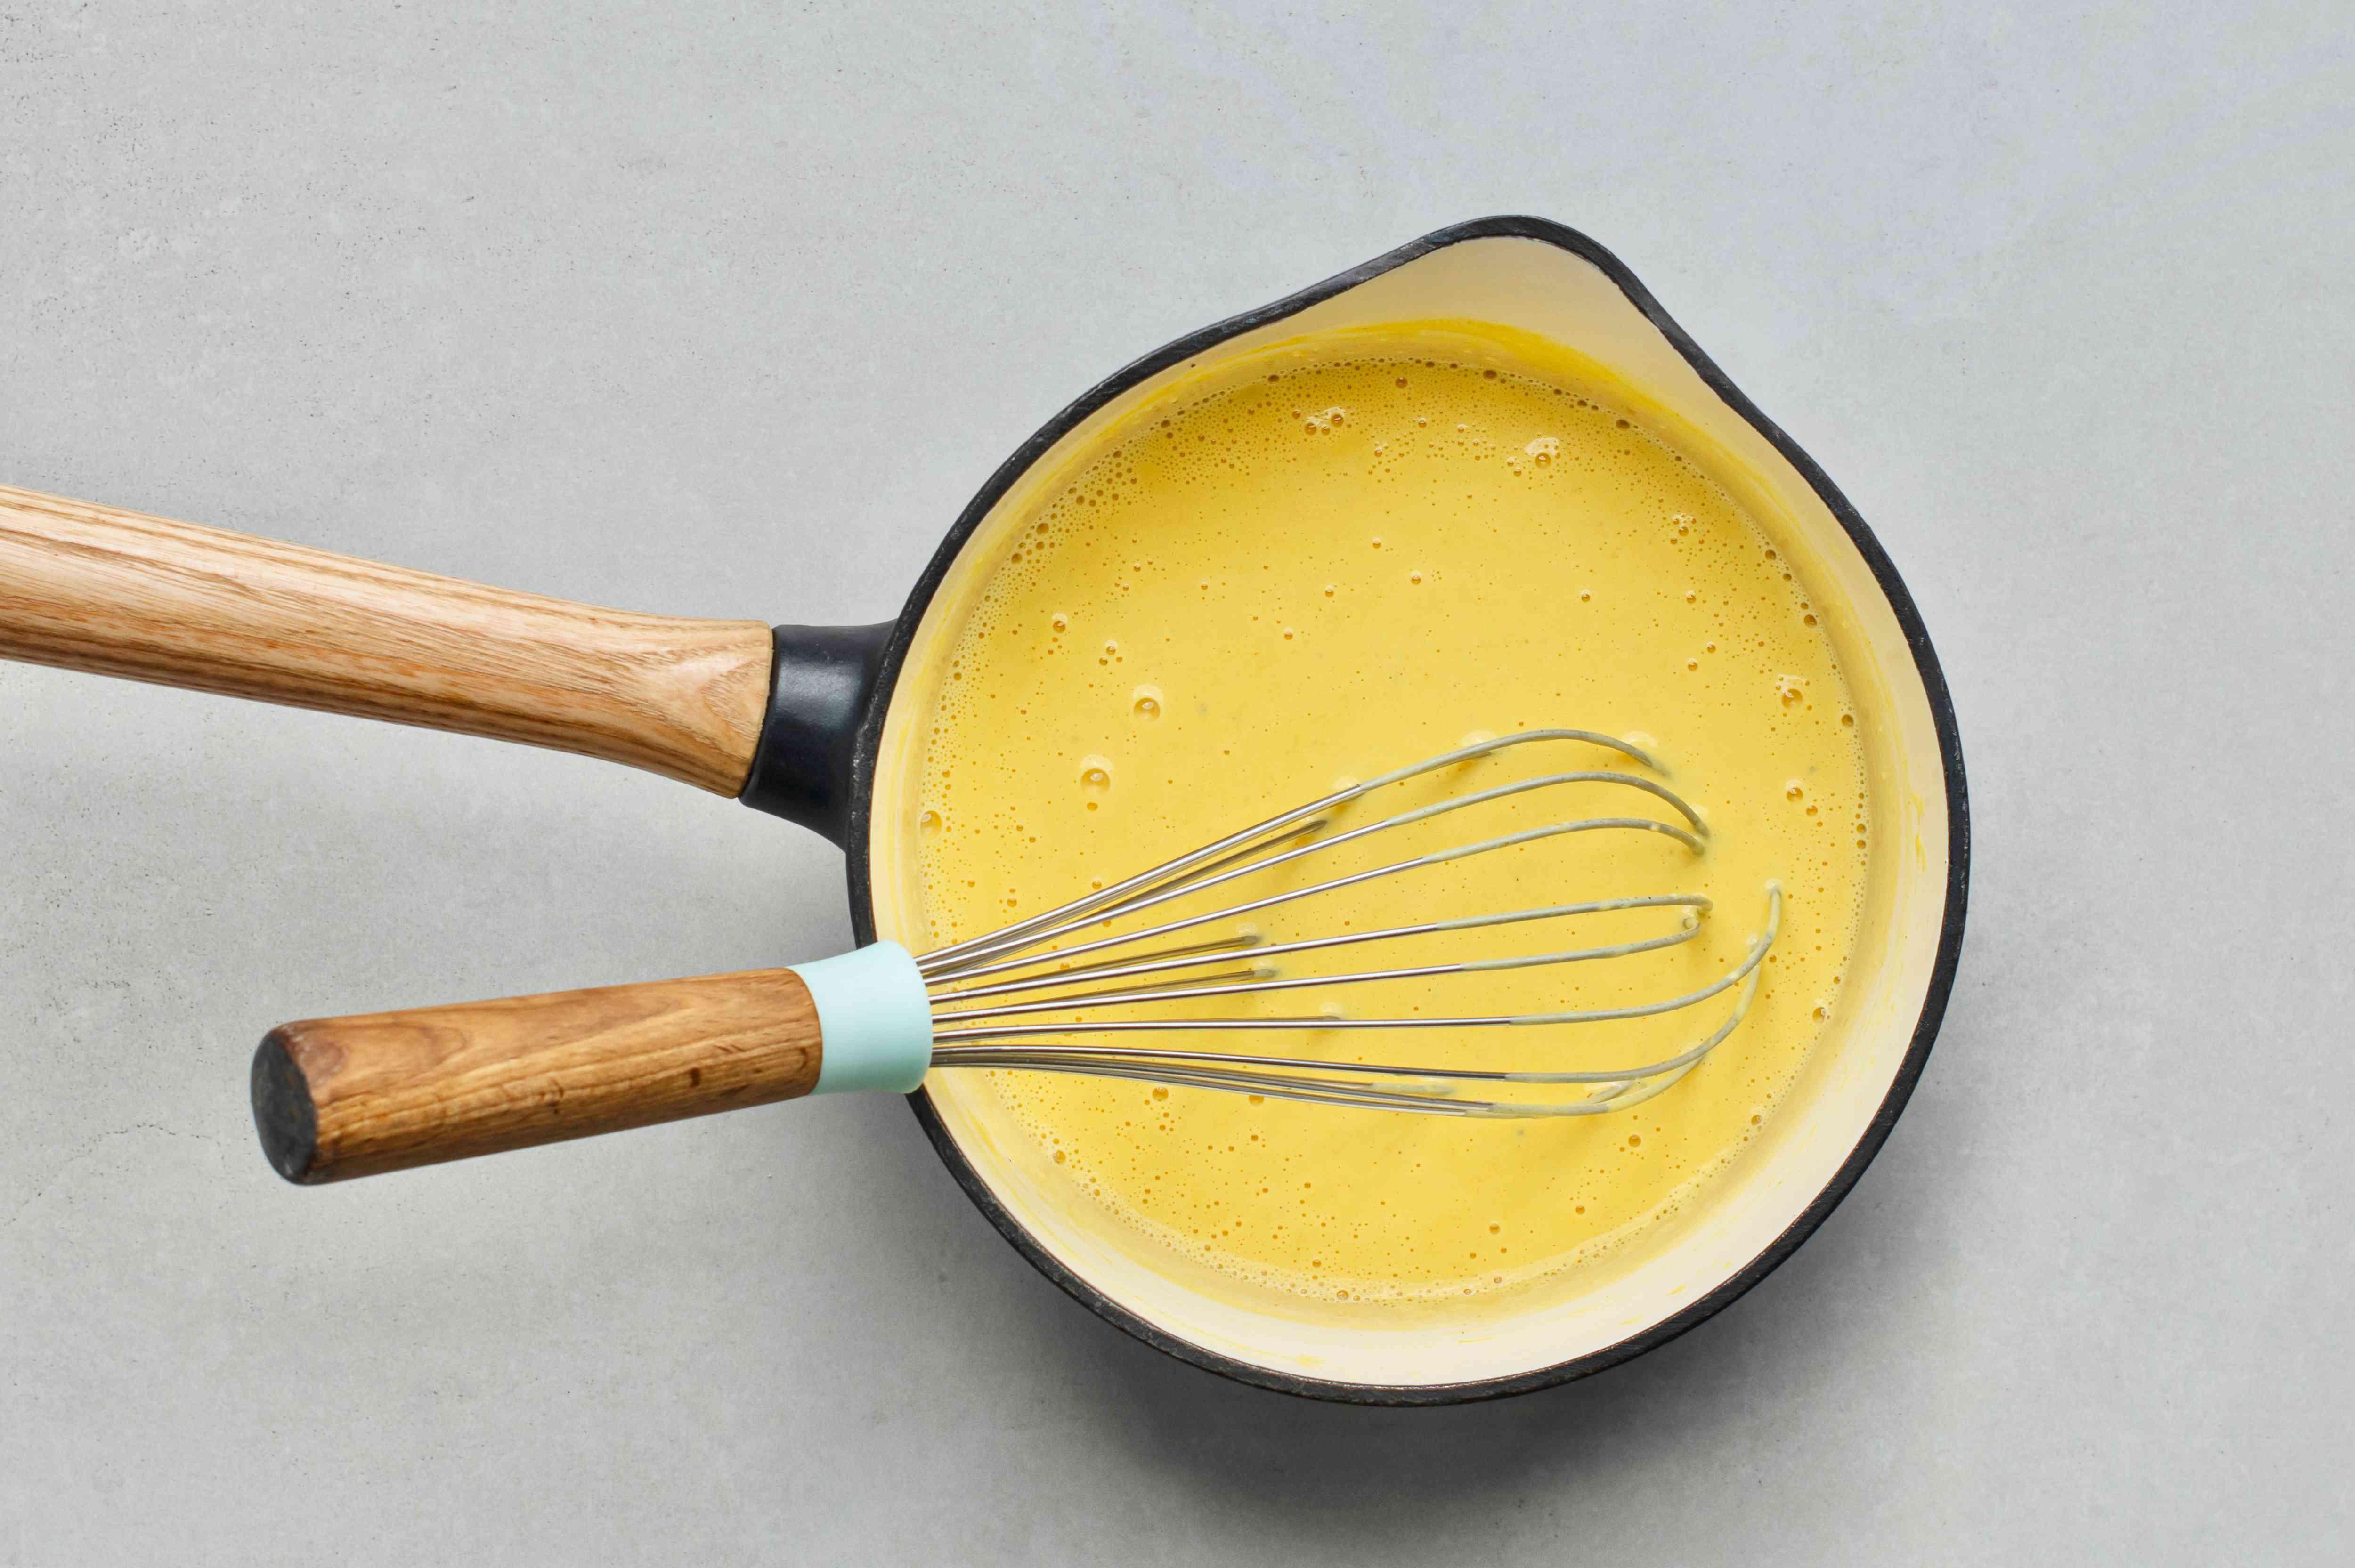 cheese sauce in a saucepan